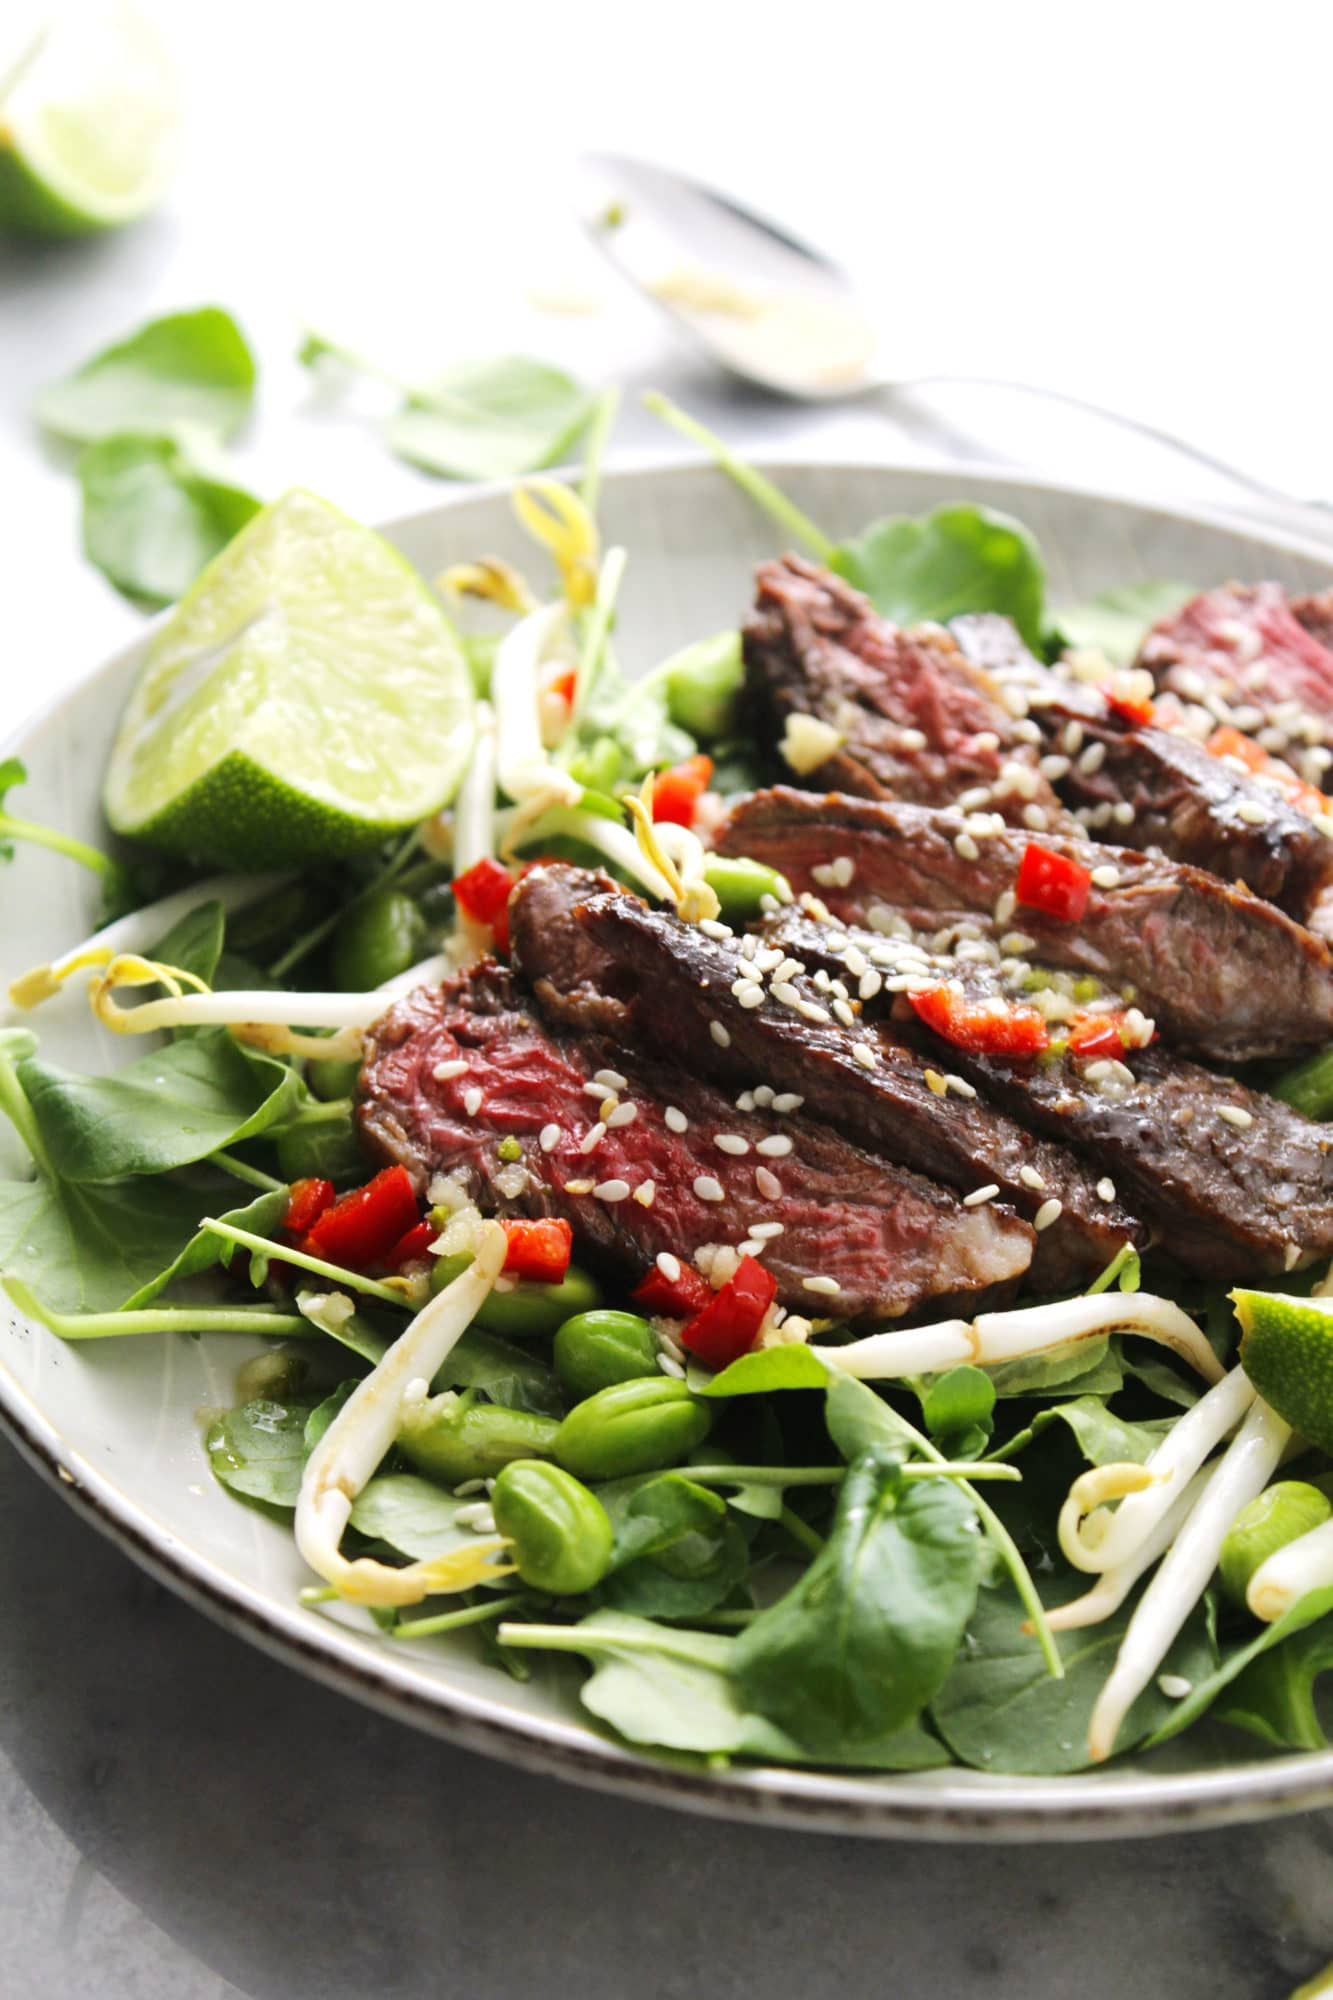 Korean BBQ Steak Salad on gray dish